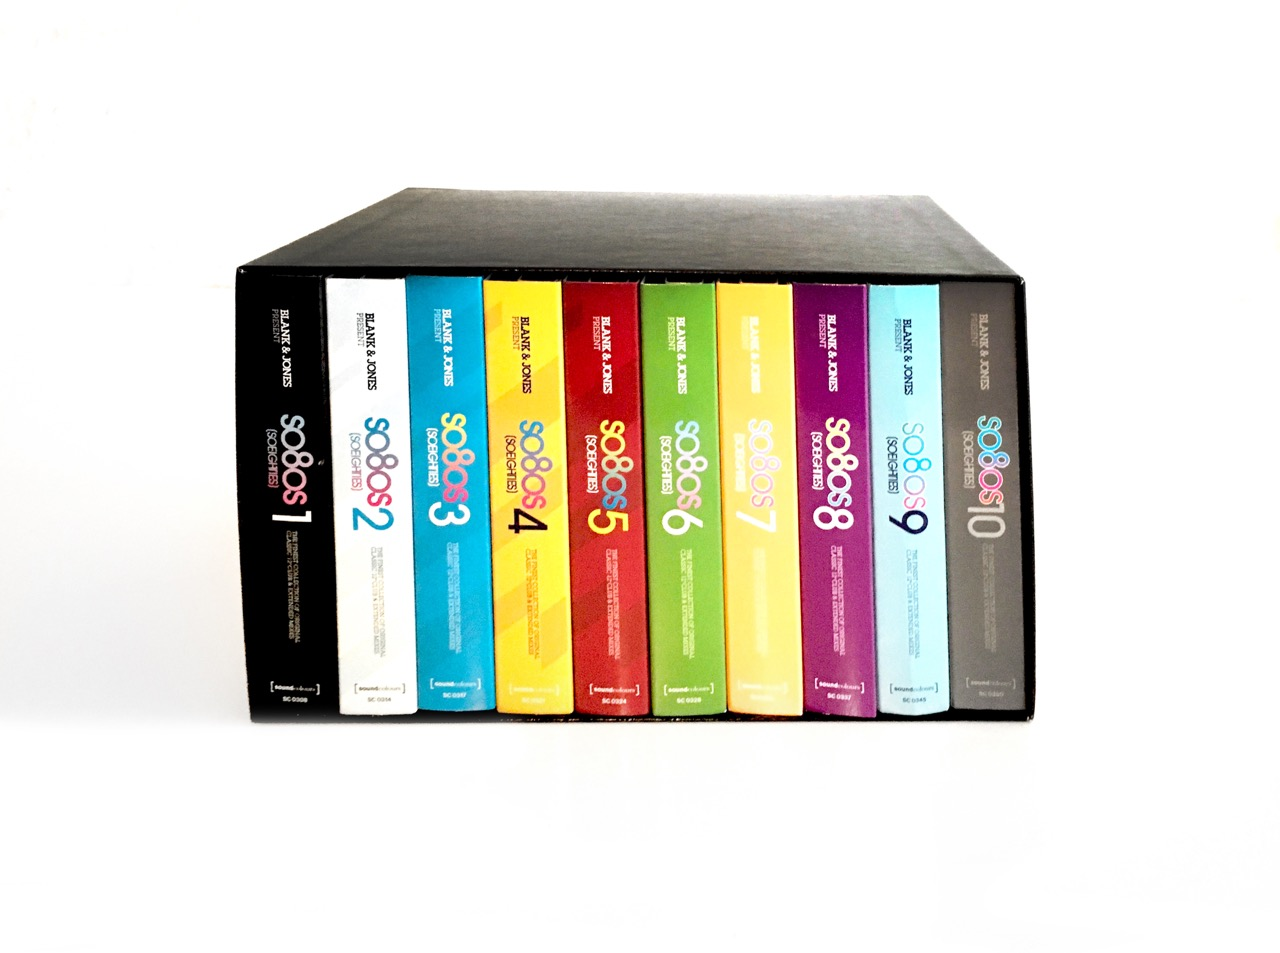 Blank & Jones / so80s box set